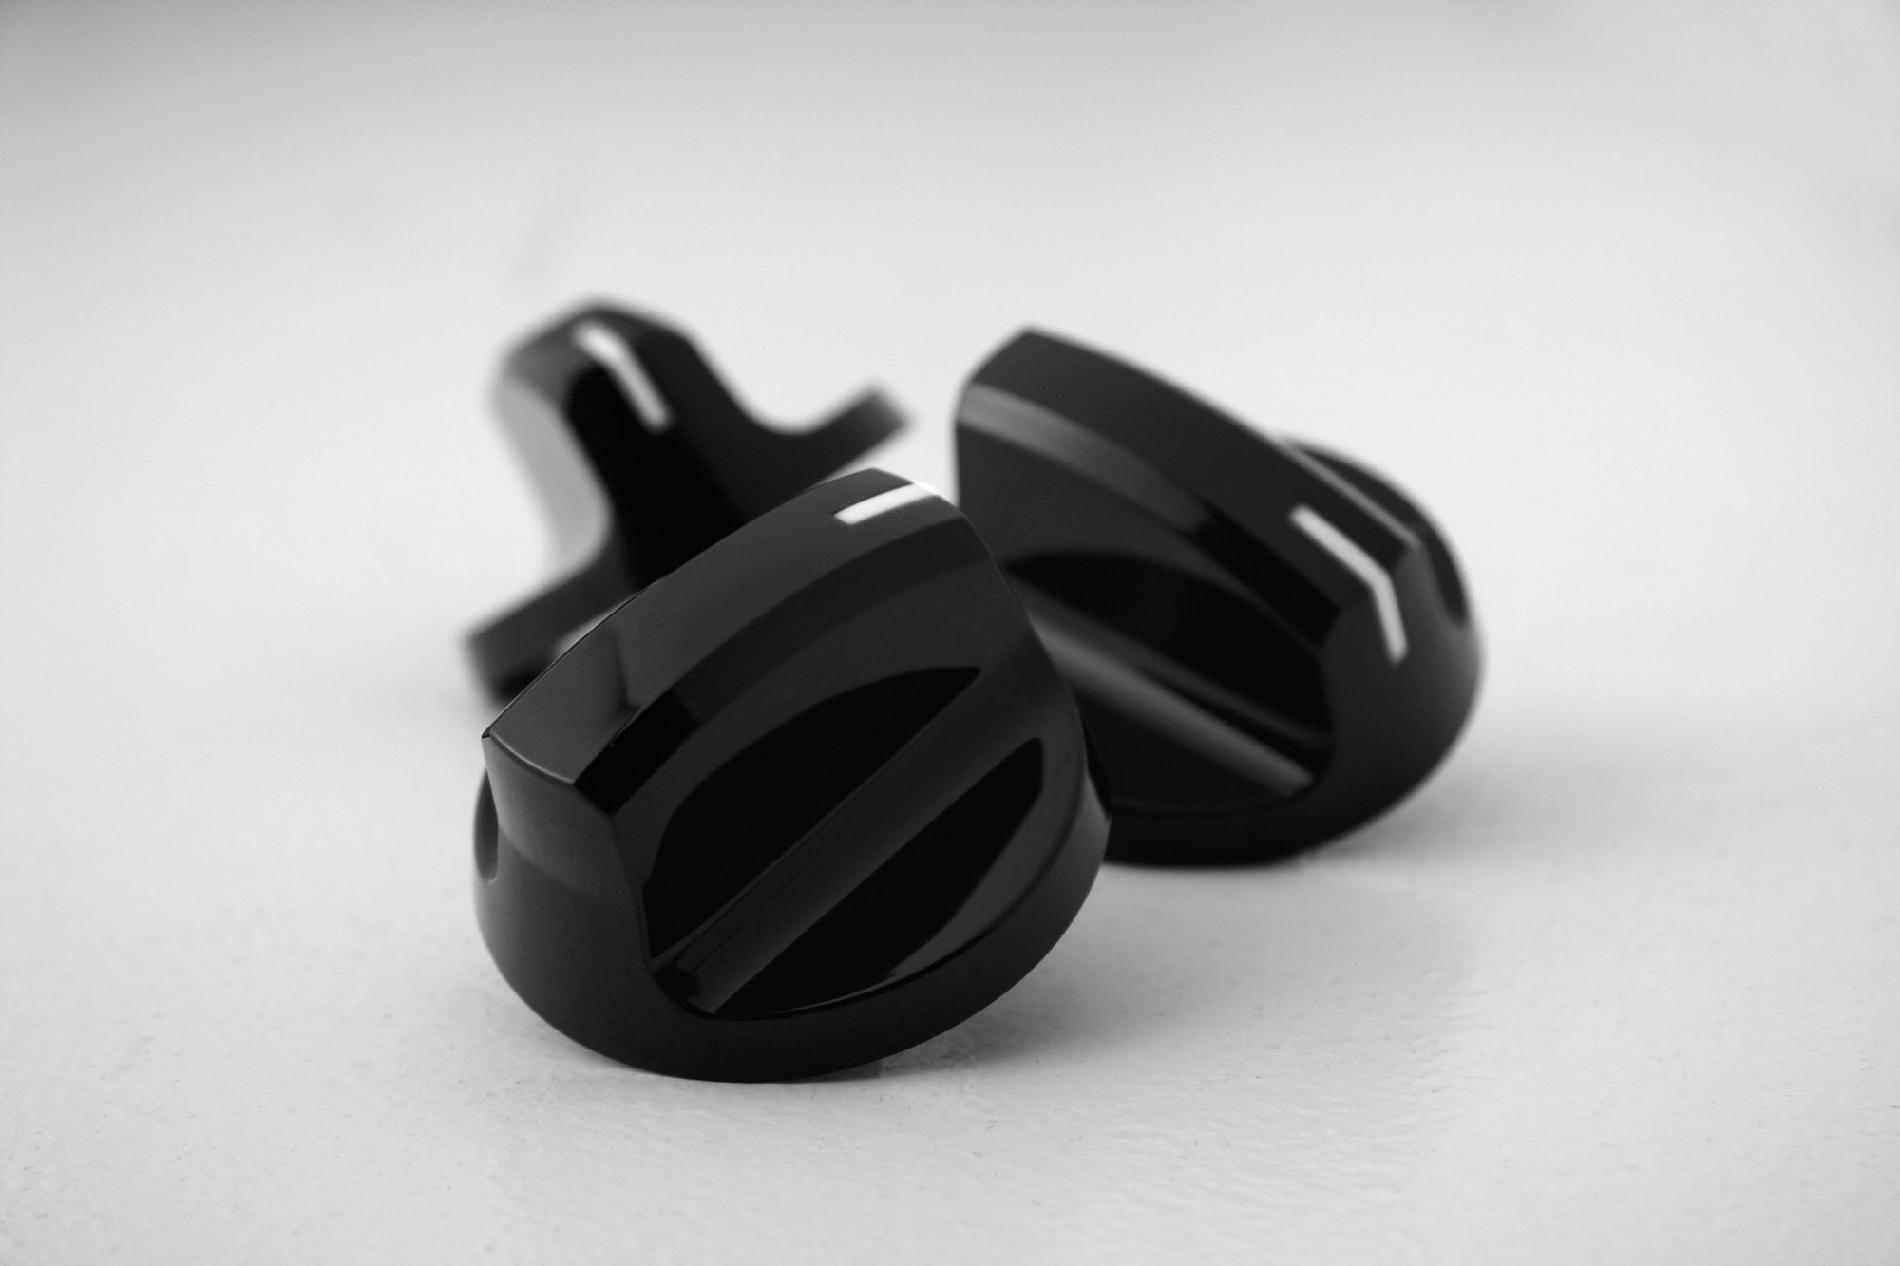 Frigidaire 4.8 cu. ft. Electric Range - Black